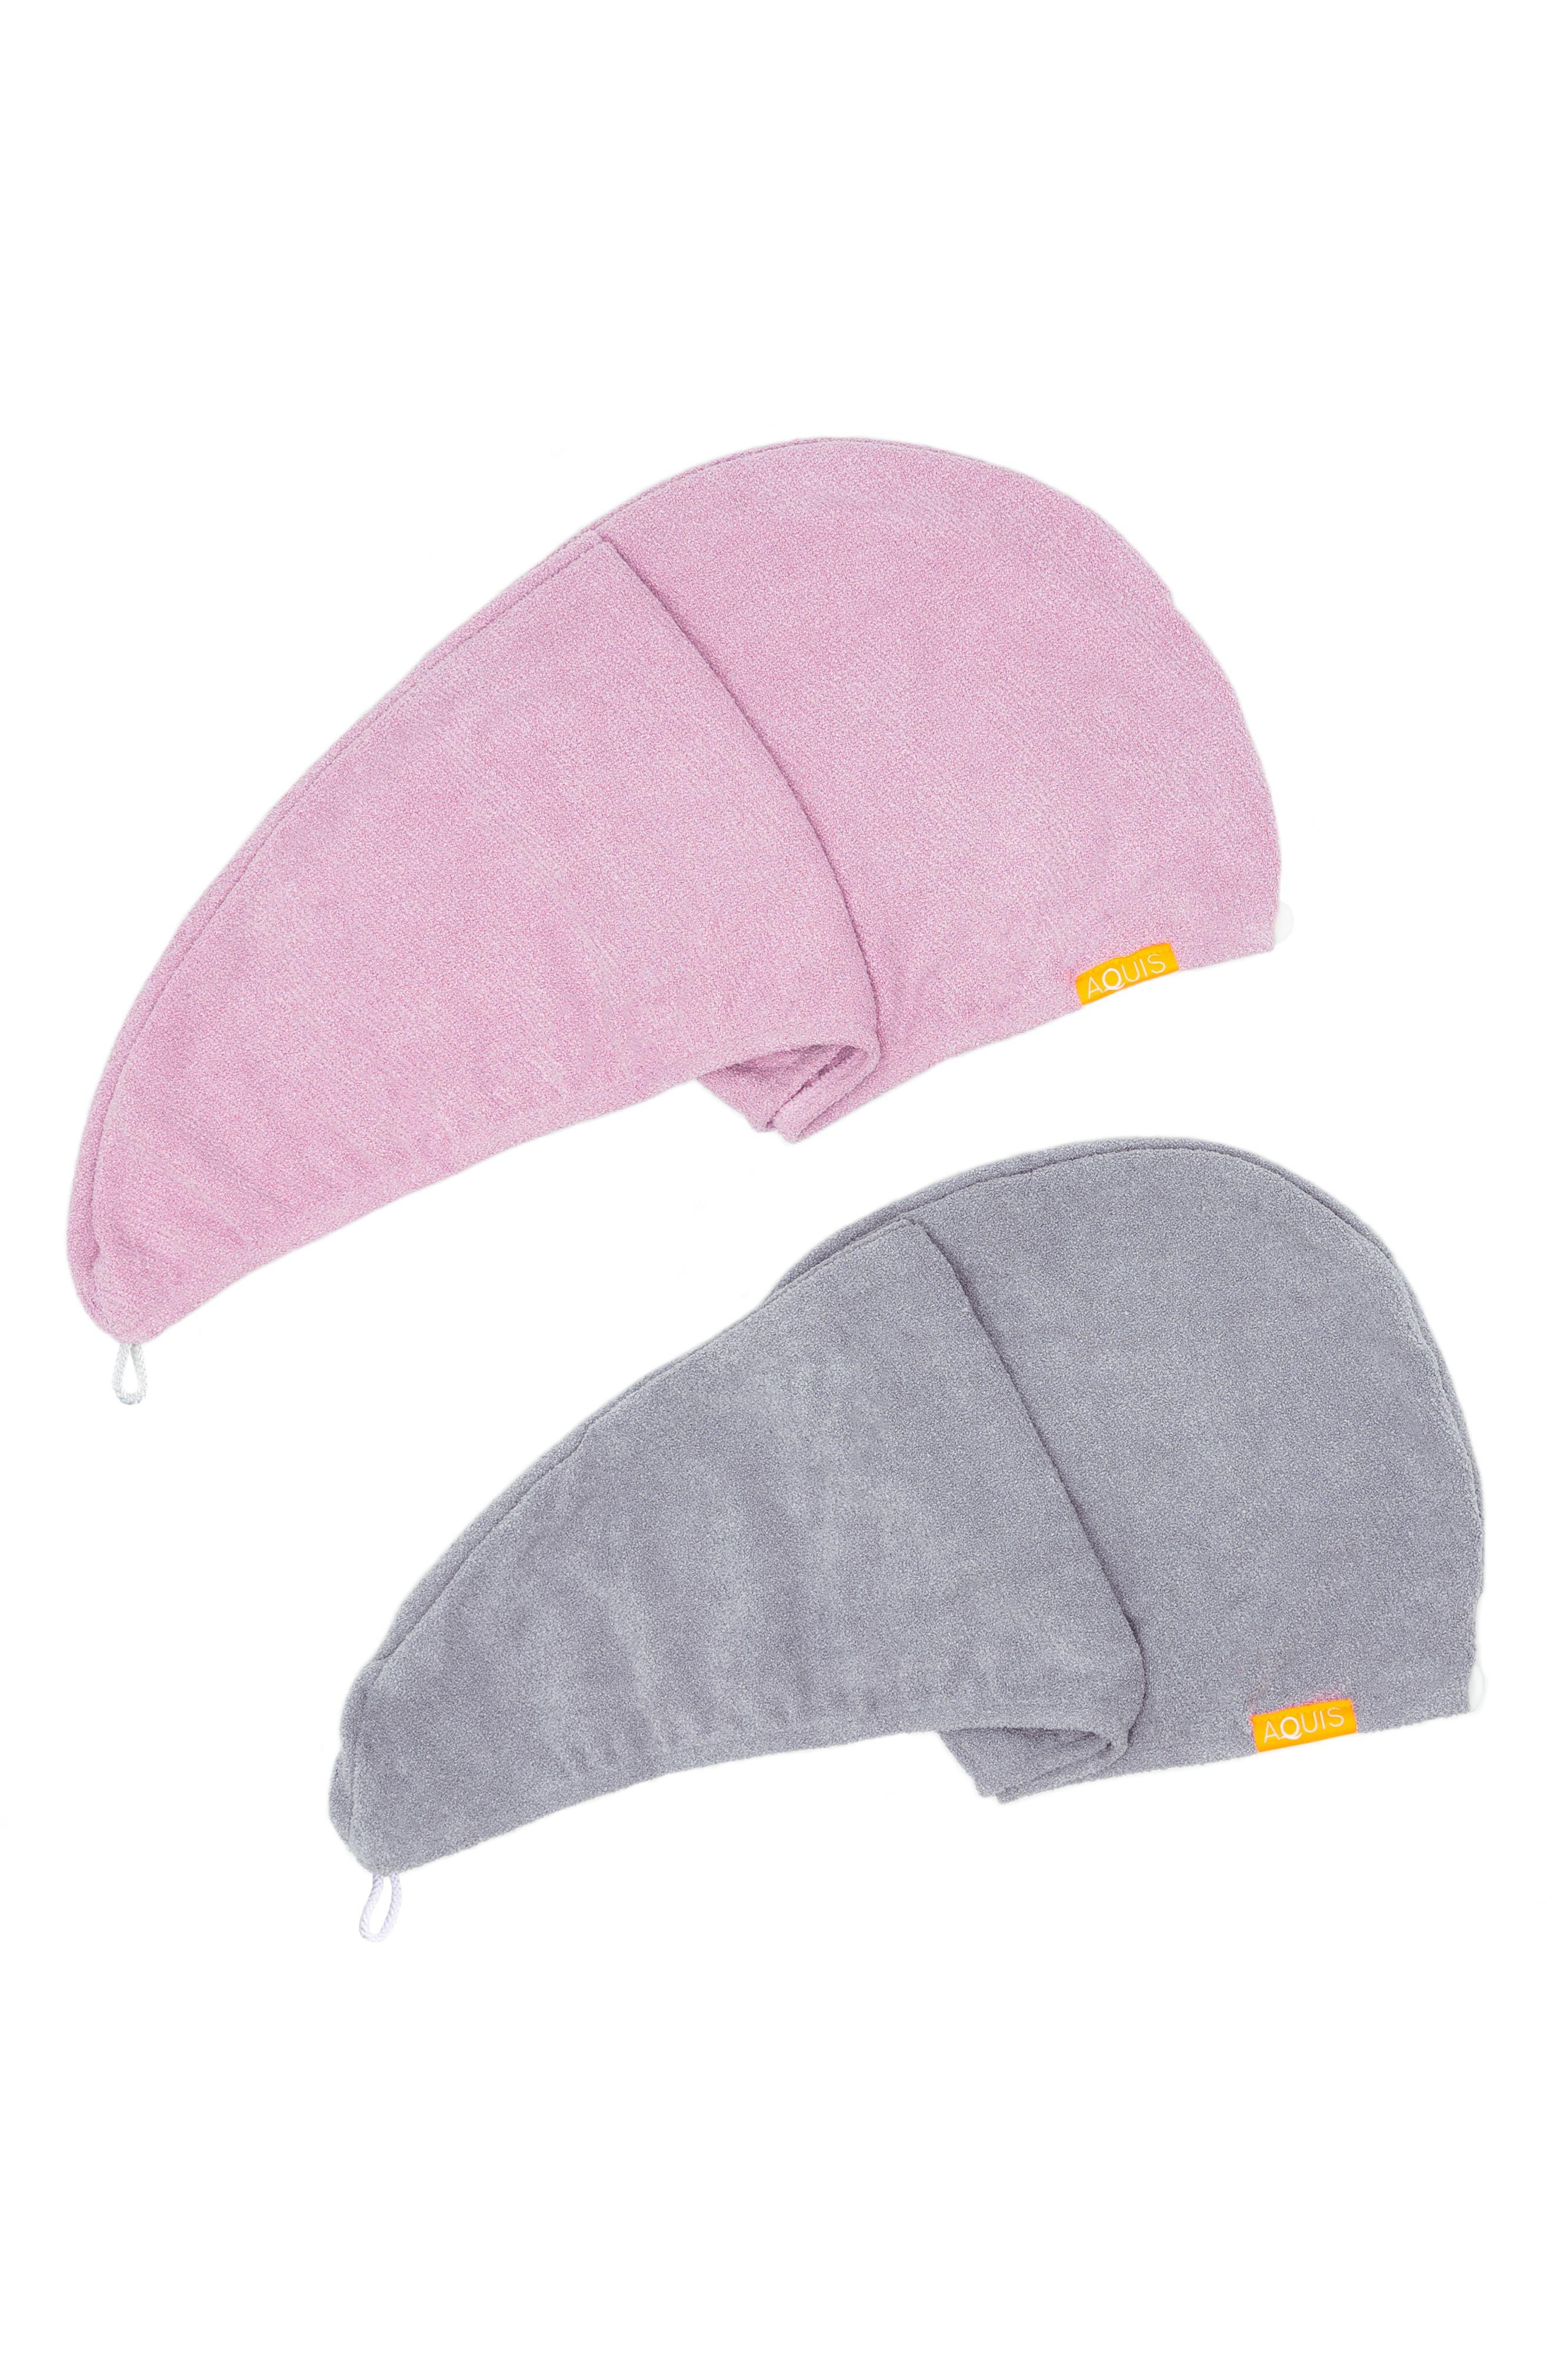 Rapid Dry Lisse Hair Wrap Towel Duo-$60 Value